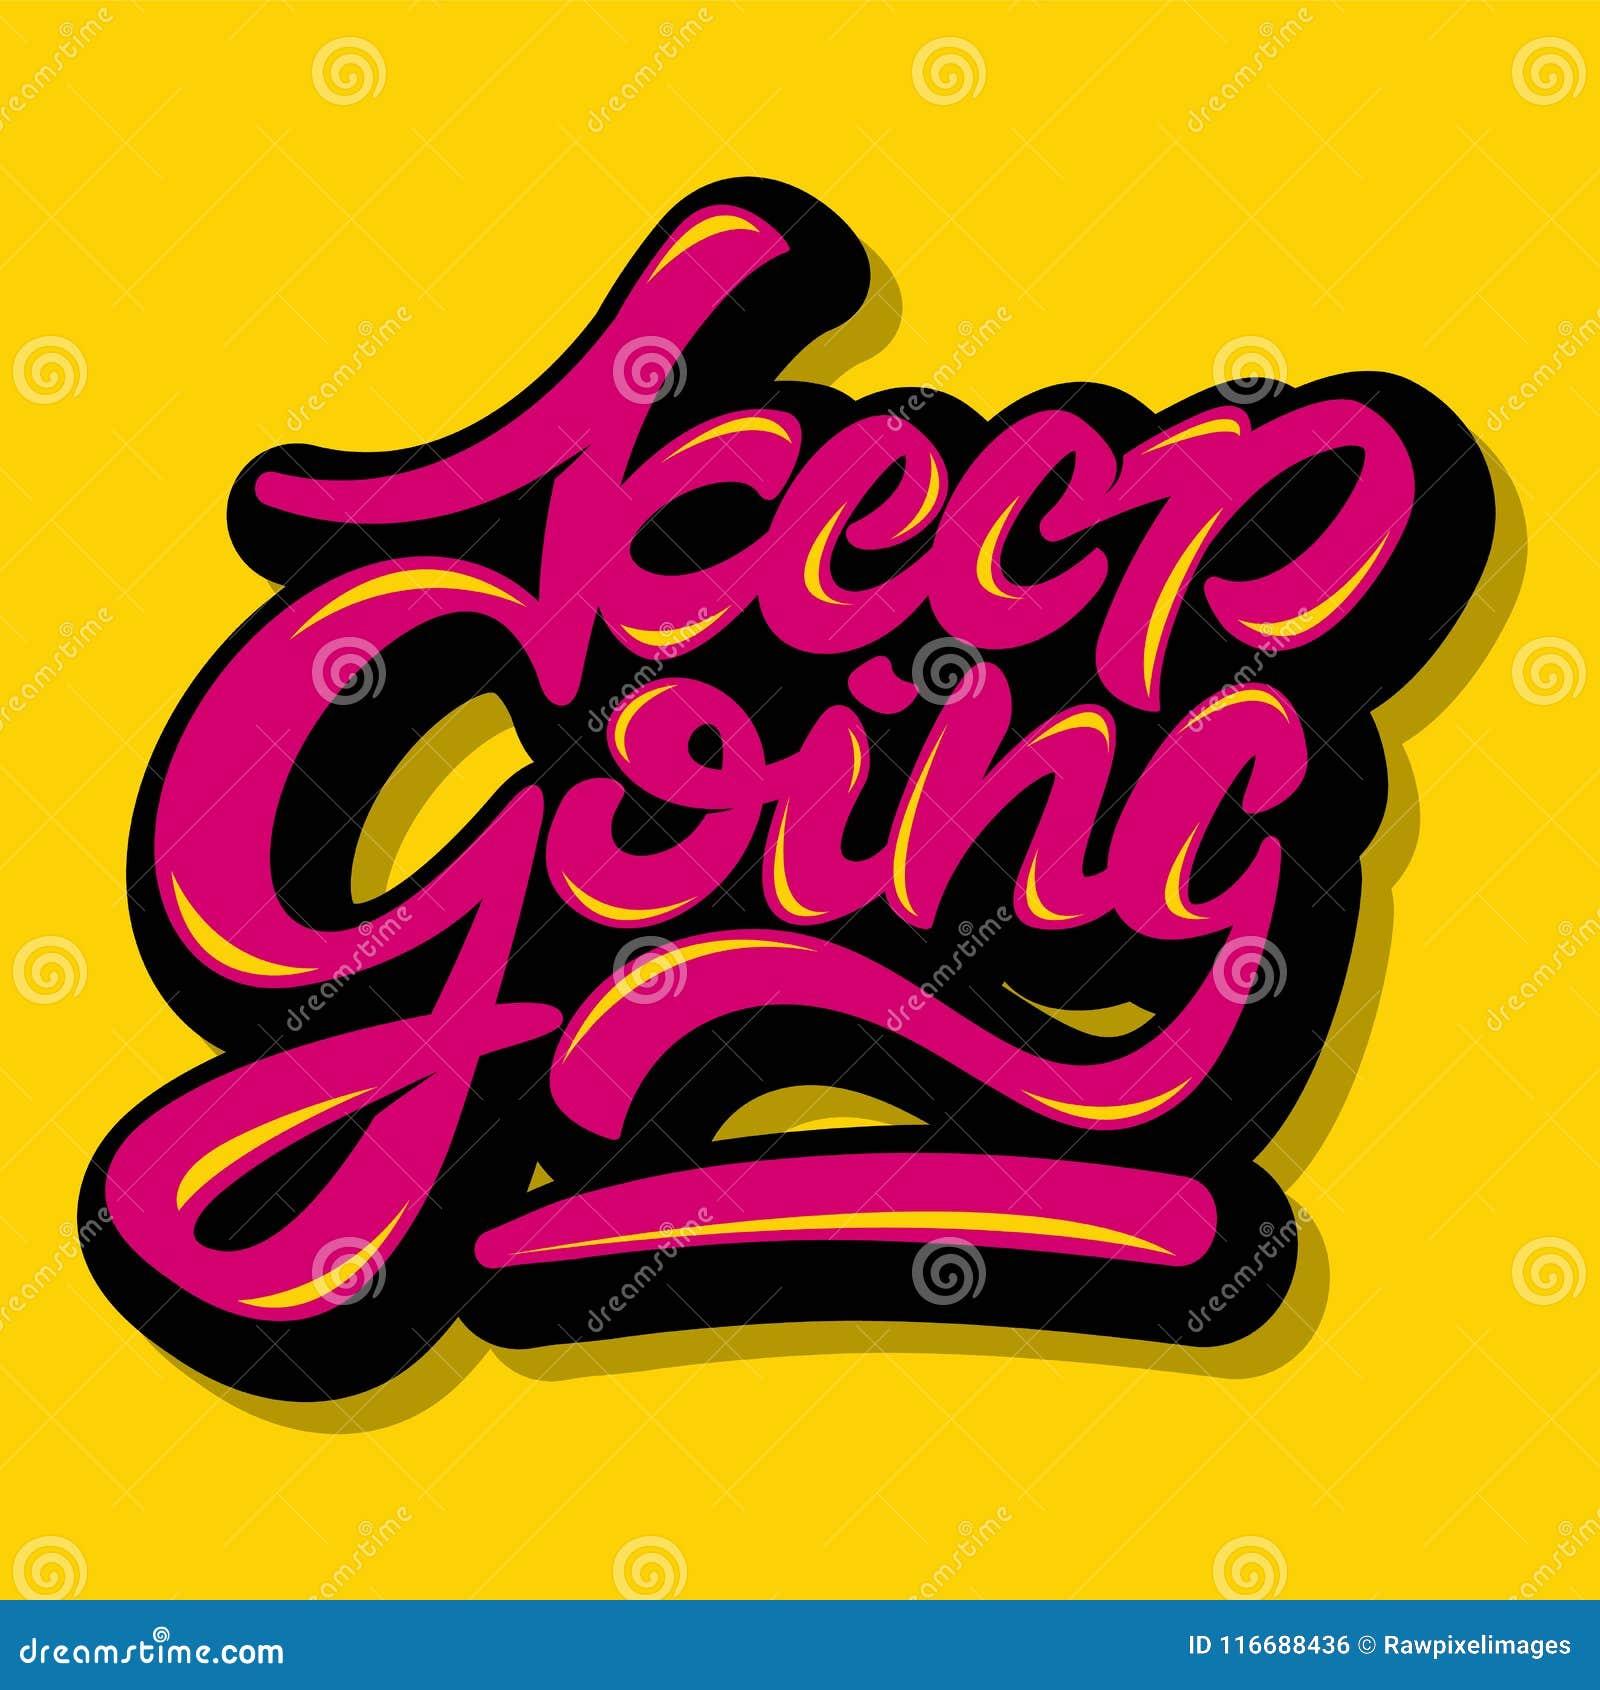 Keep Going Inspirational Quote Illustration Stock Illustration